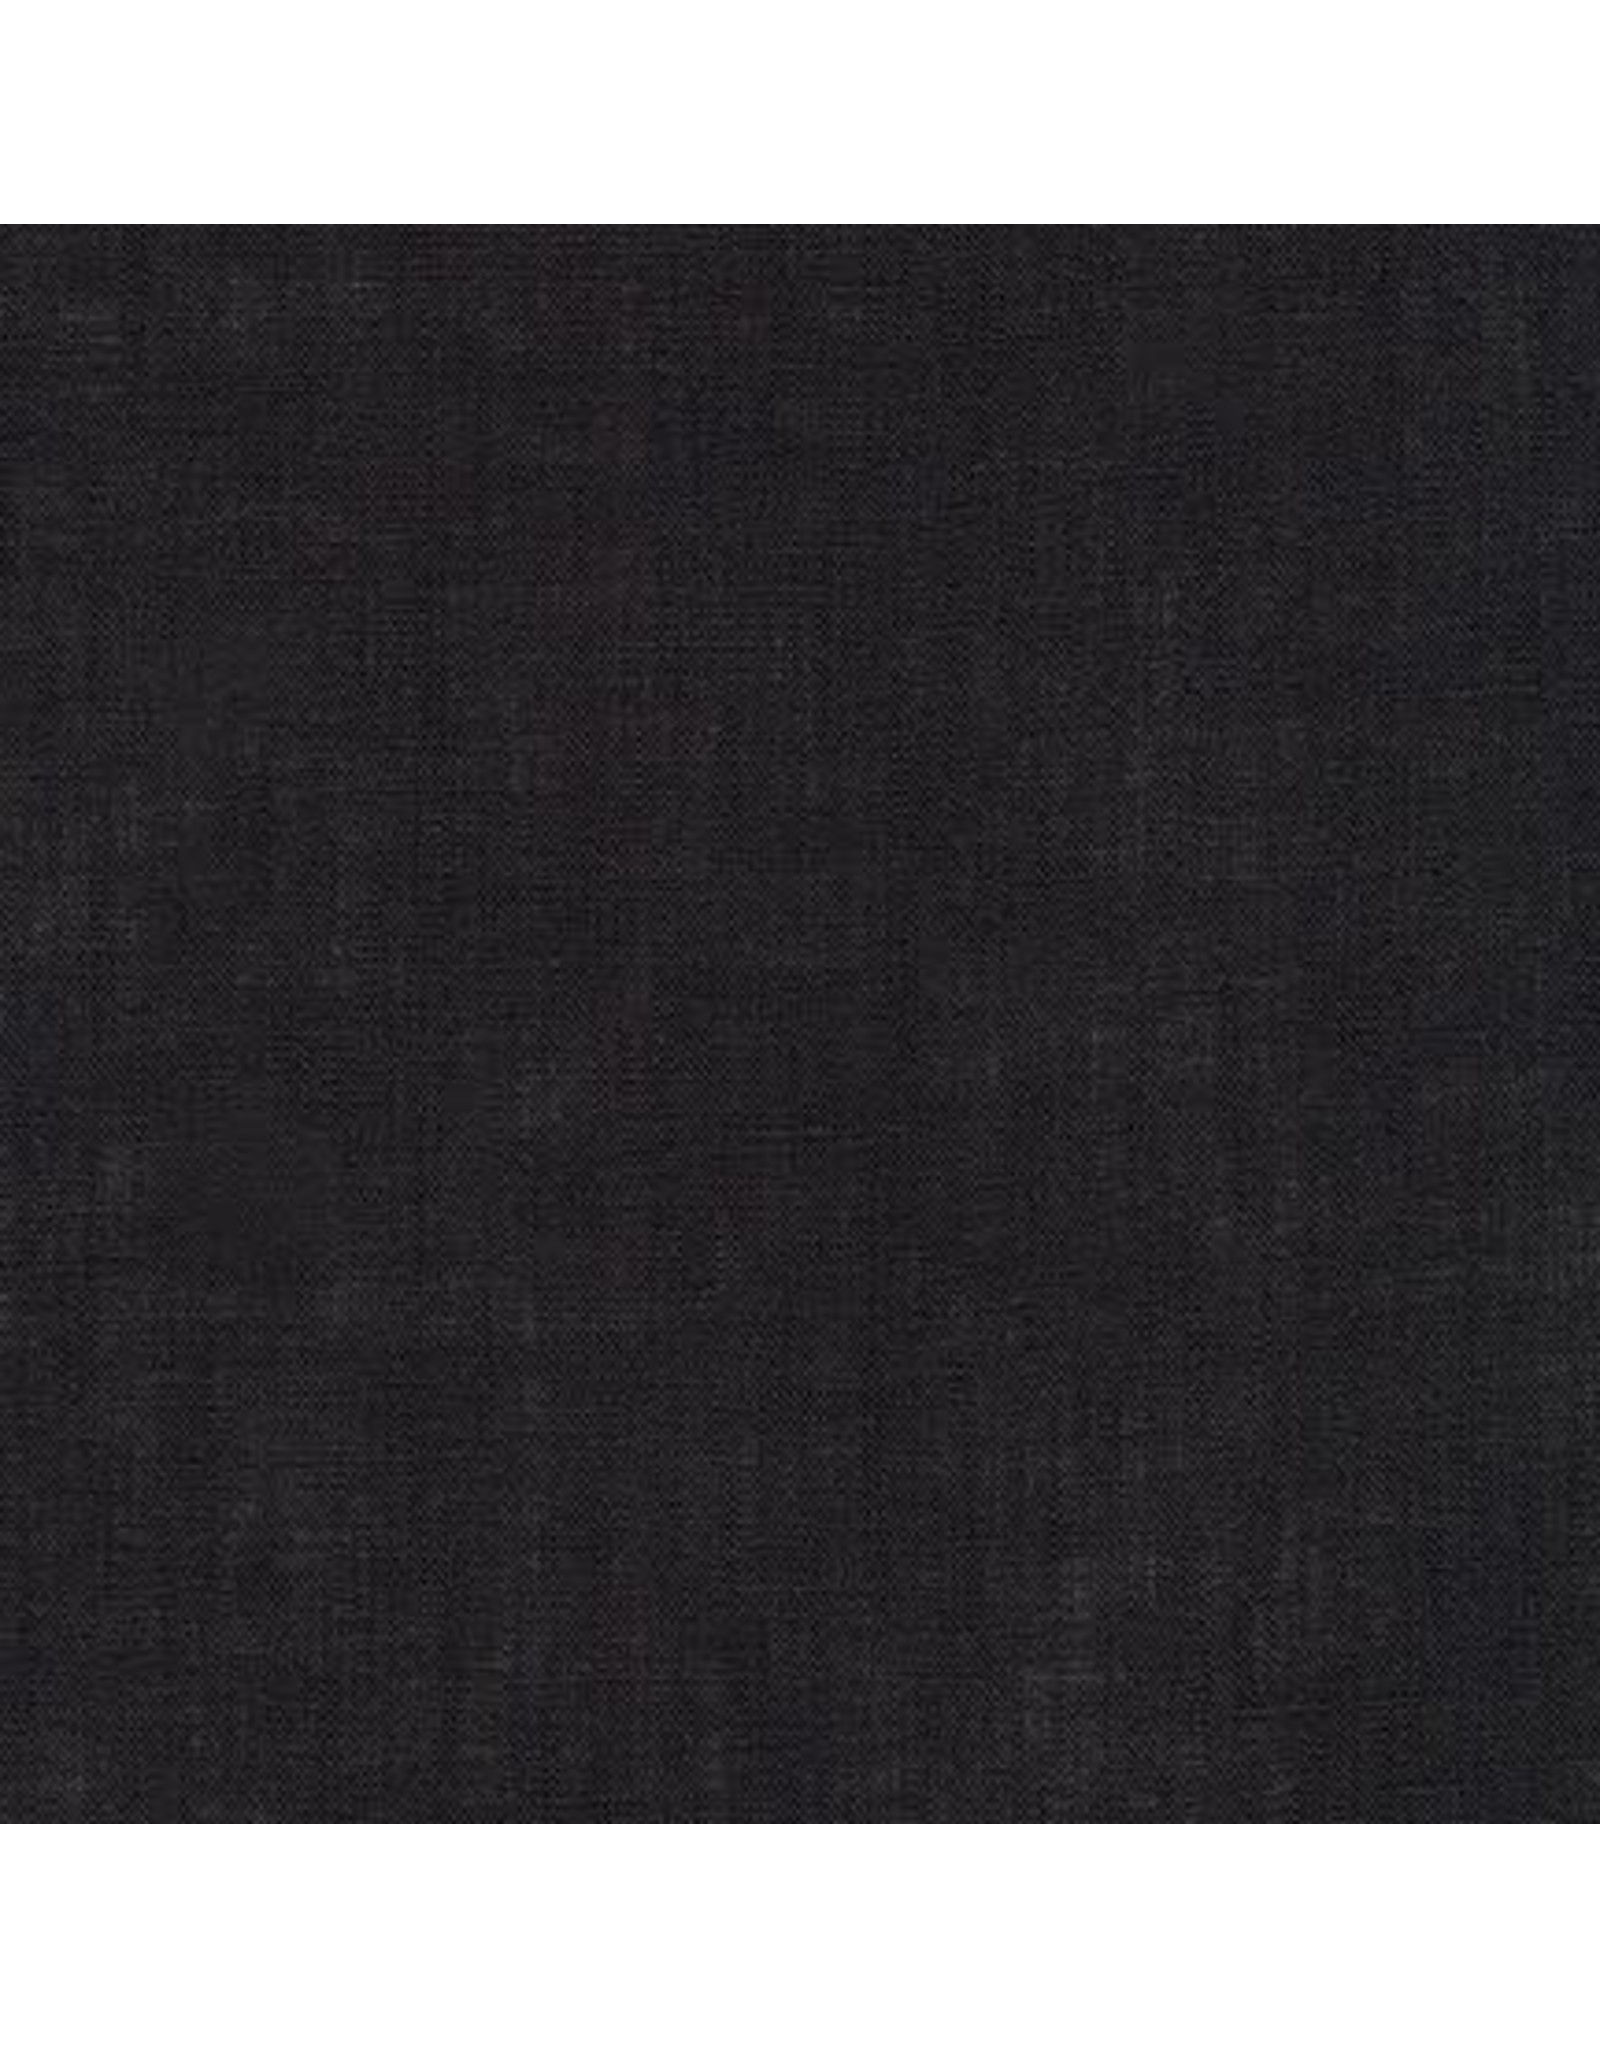 Robert Kaufman Limerick Linen in Black, Fabric Half-Yards